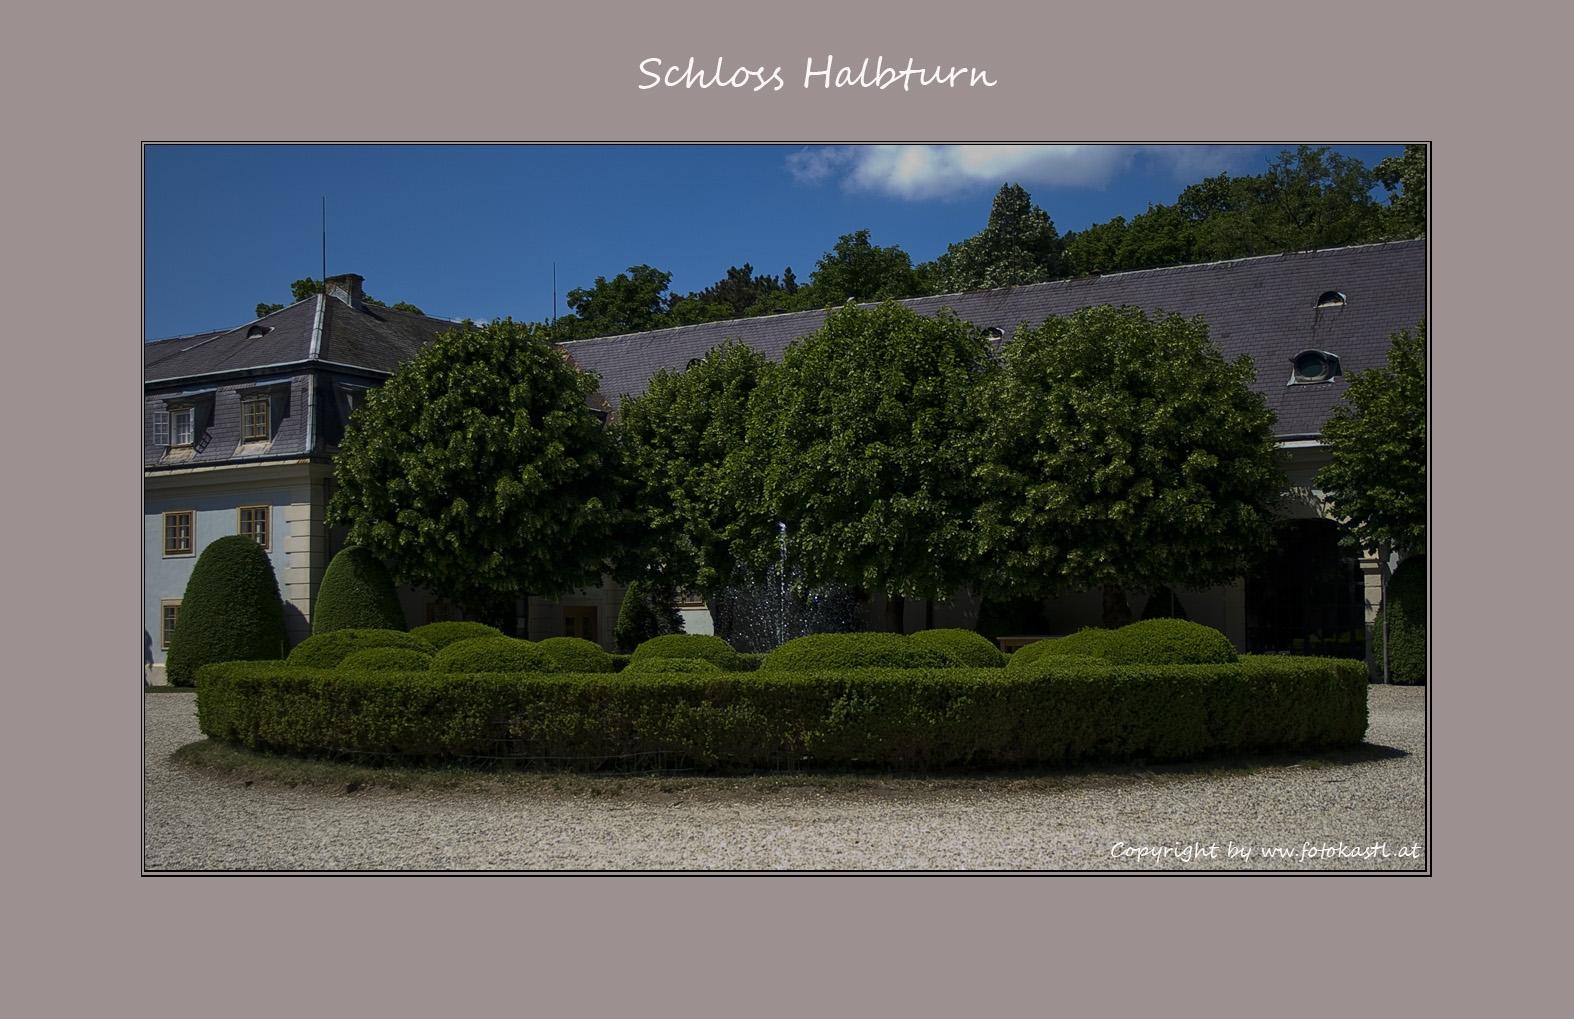 Schloss Halbturn